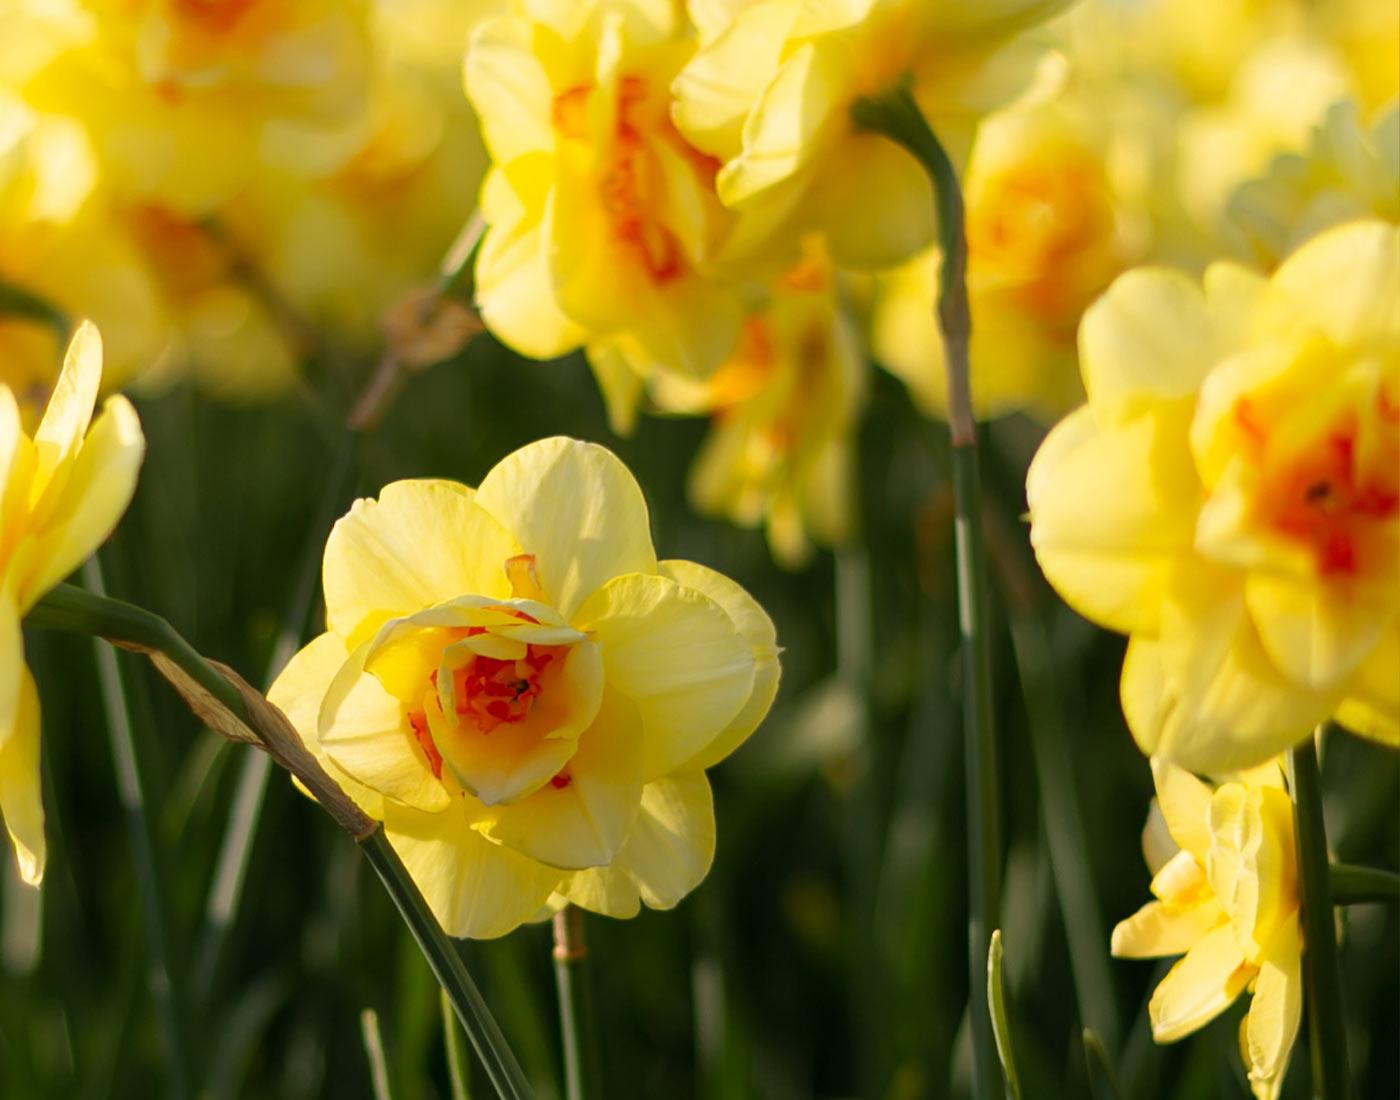 narcissus, fragrant flowers